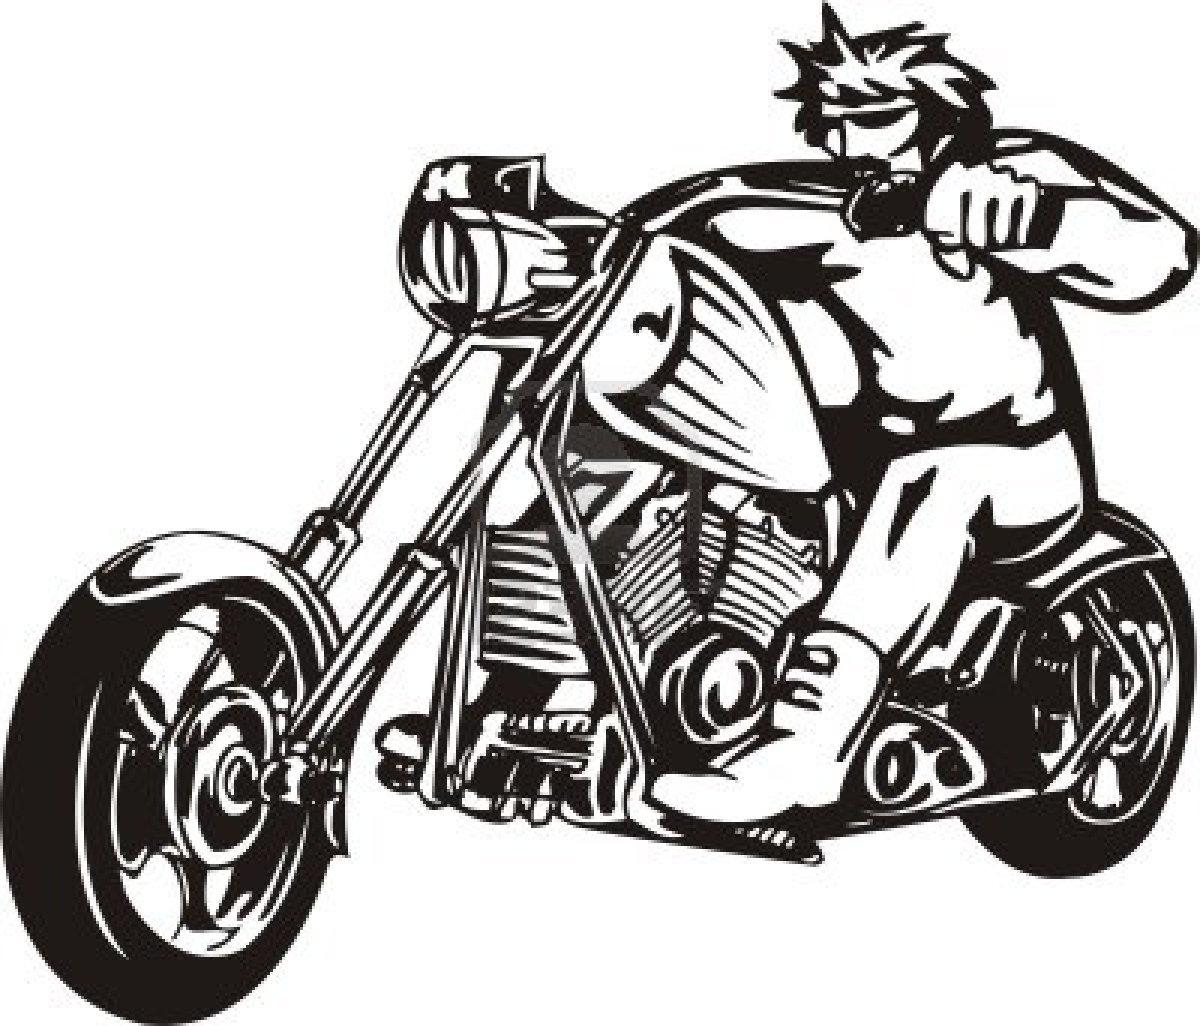 Harley Davidson Motorcycle Clip Art Moto-Harley Davidson Motorcycle Clip Art Motorcycle-14